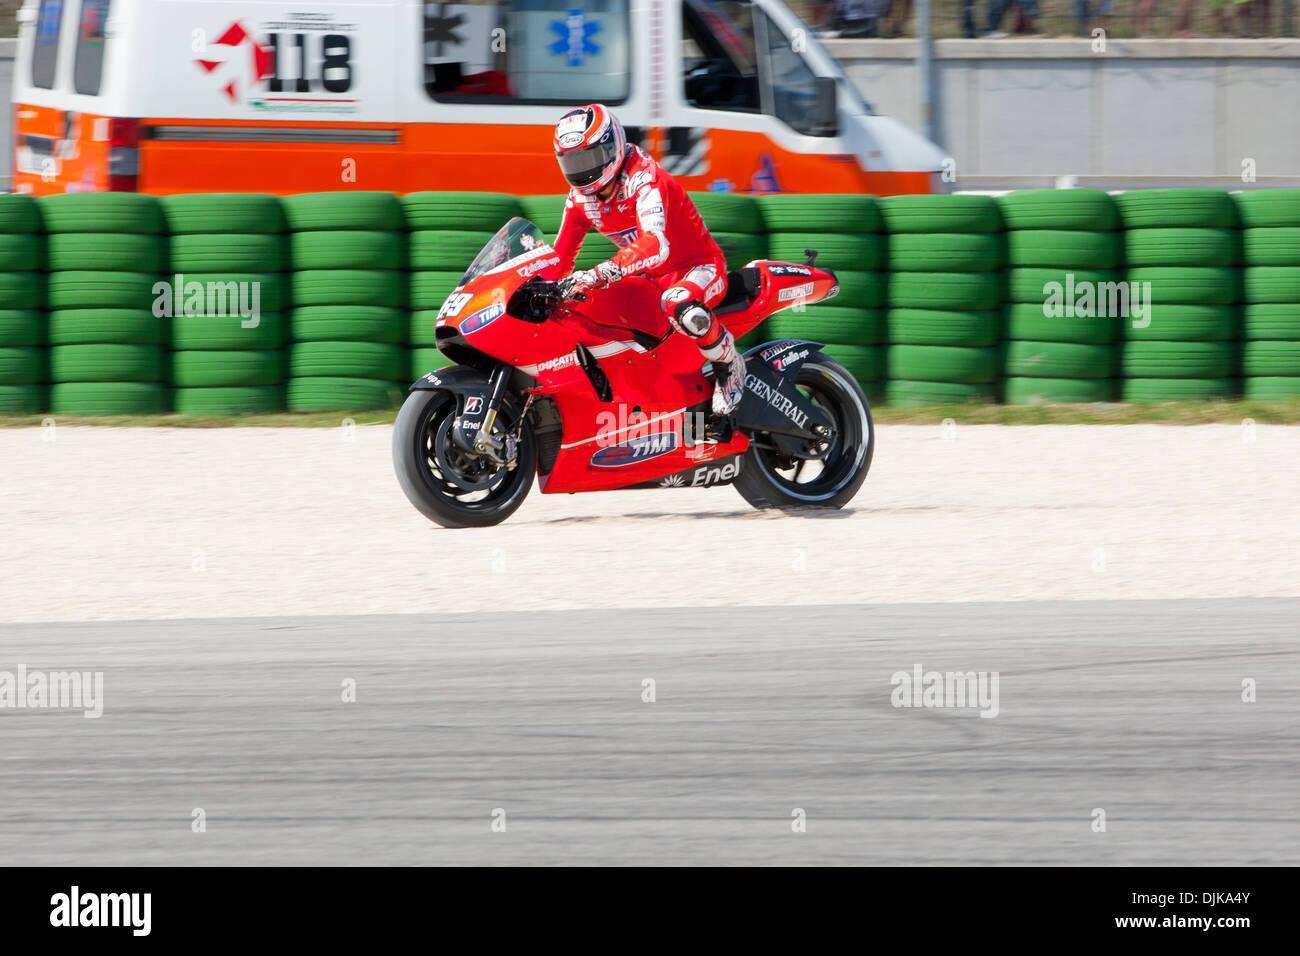 Sep. 03, 2010 - Misano Adriatico, Italy - Ducati rider Nicky Hayden (USA #69) during the first MotoGp practice session for the San Marino GP in Misano Adriatico, Italy. Hayden finished the practice at the 7th place. (Credit Image: © Andrea Ranalli/Southcreek Global/ZUMApress.com) - Stock Image